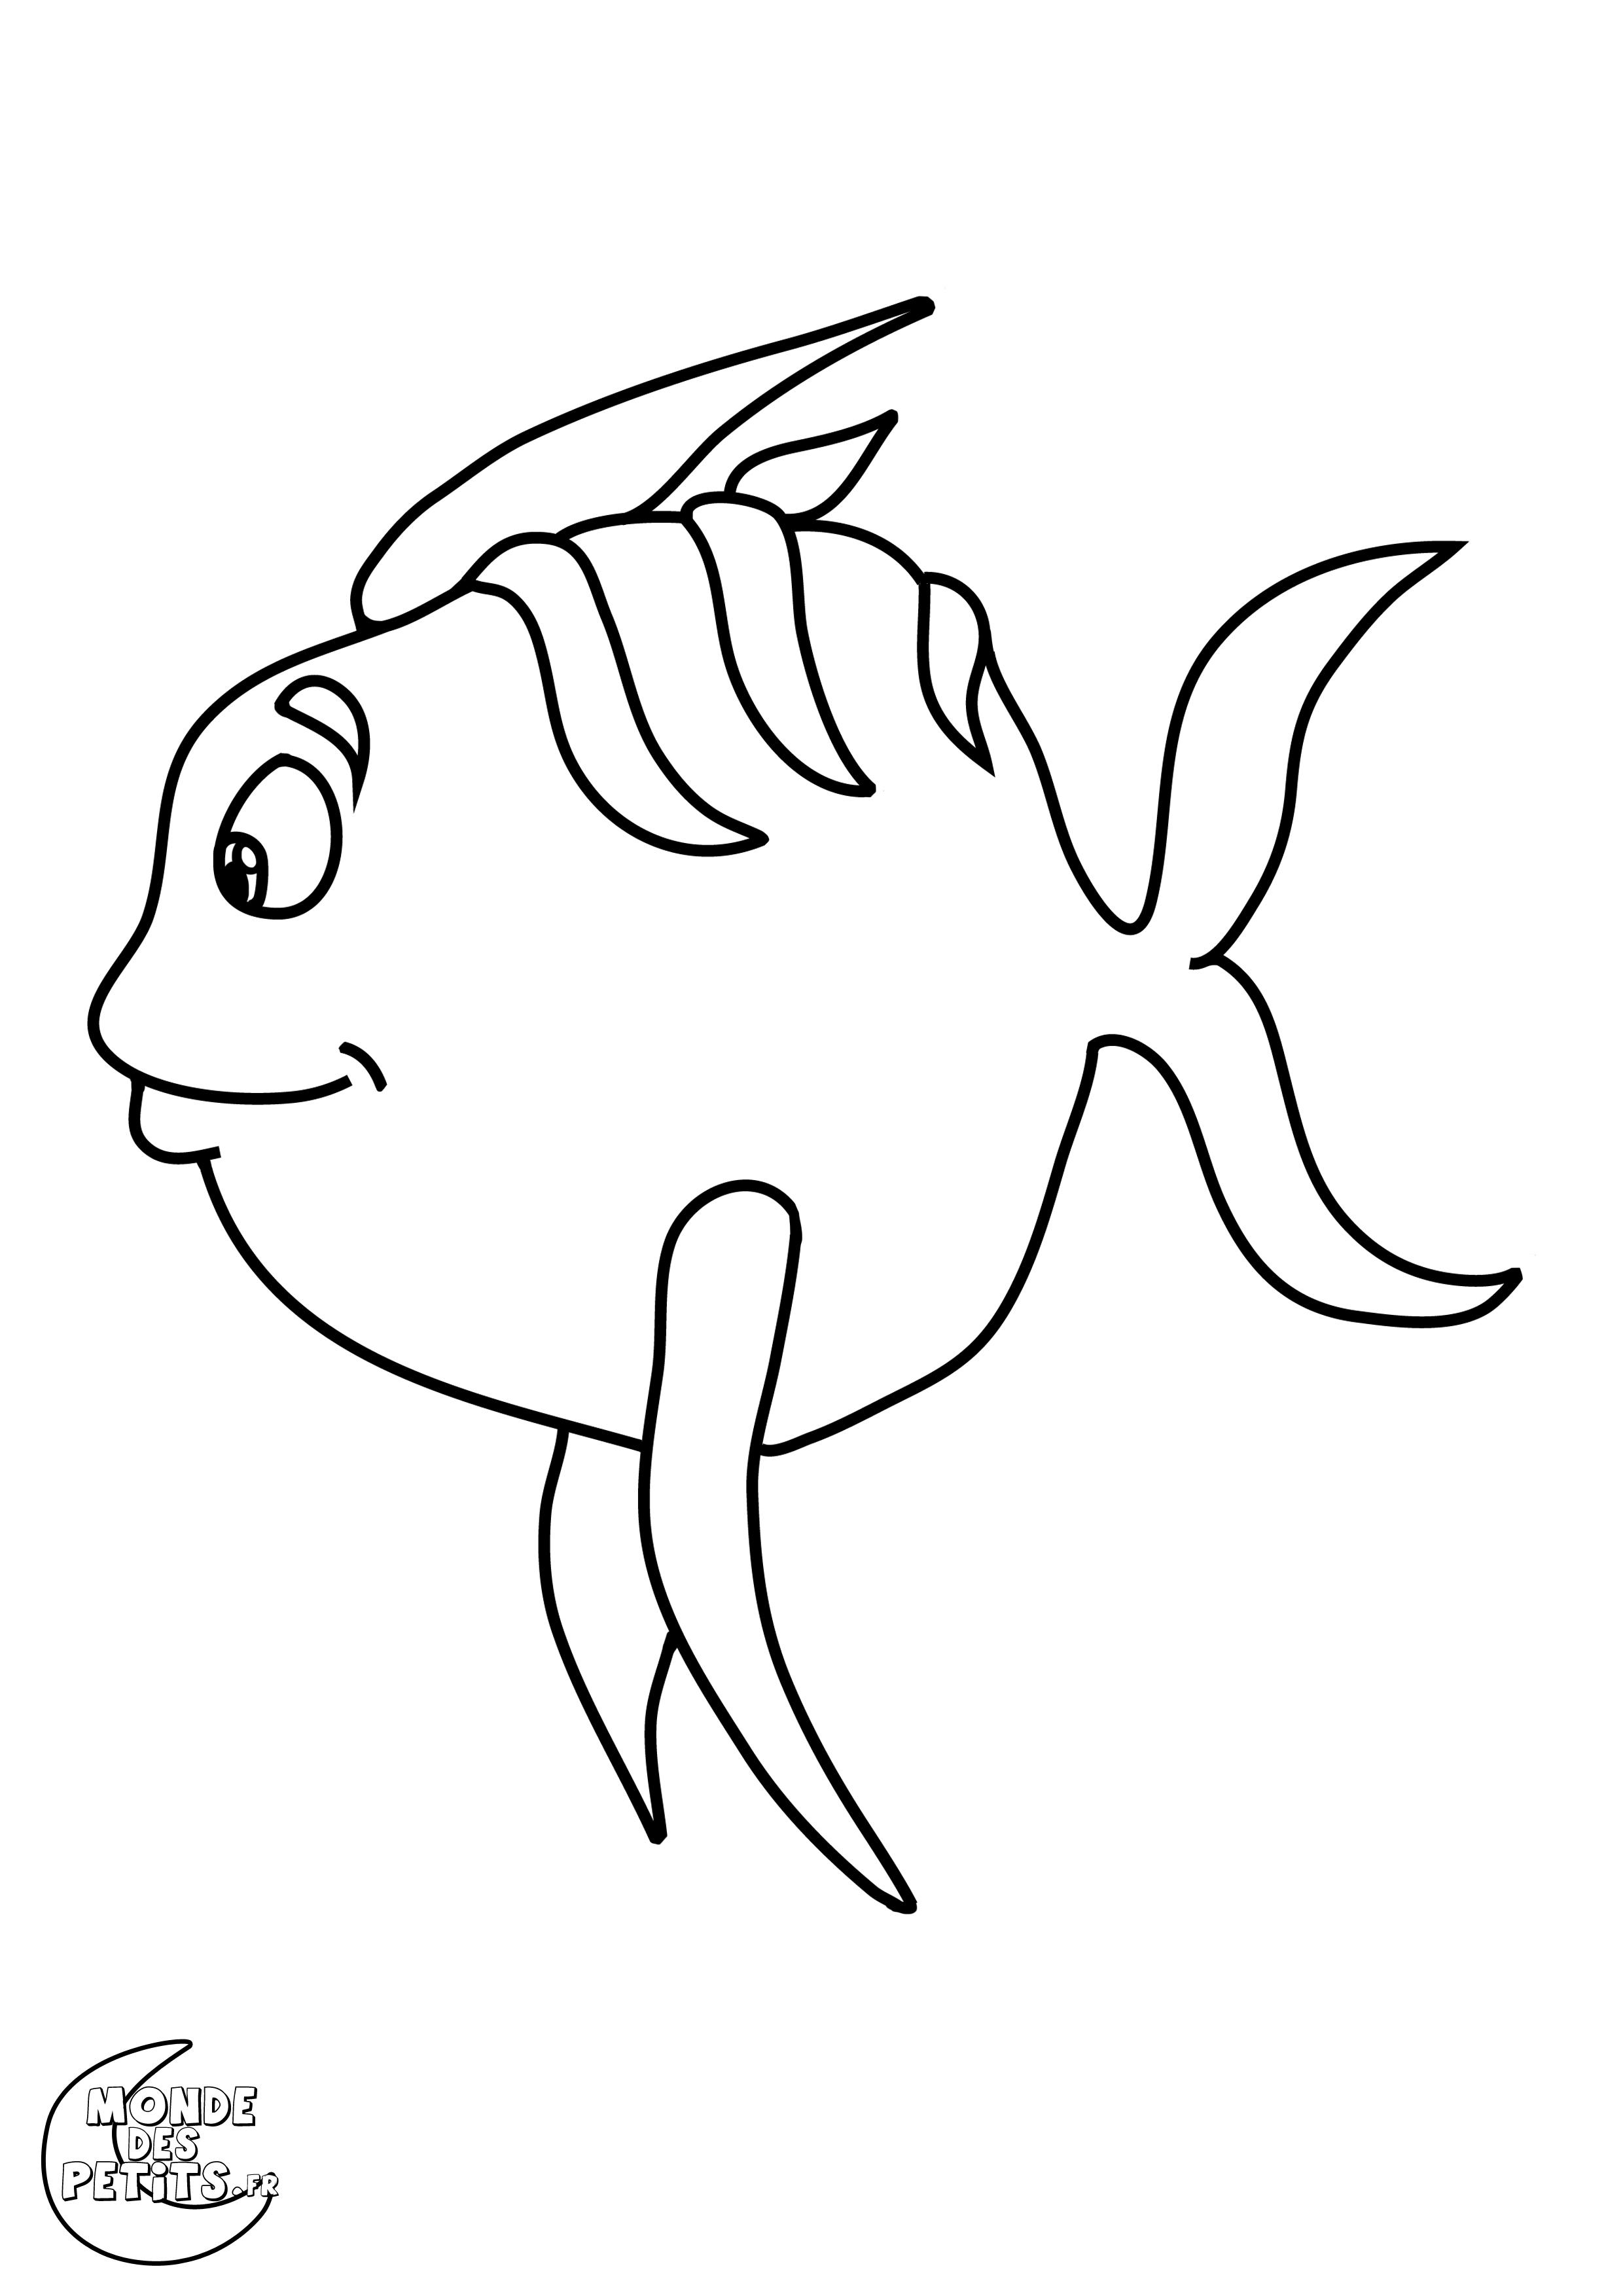 Dessin poisson rigolo couleur - Poisson rouge rigolo ...